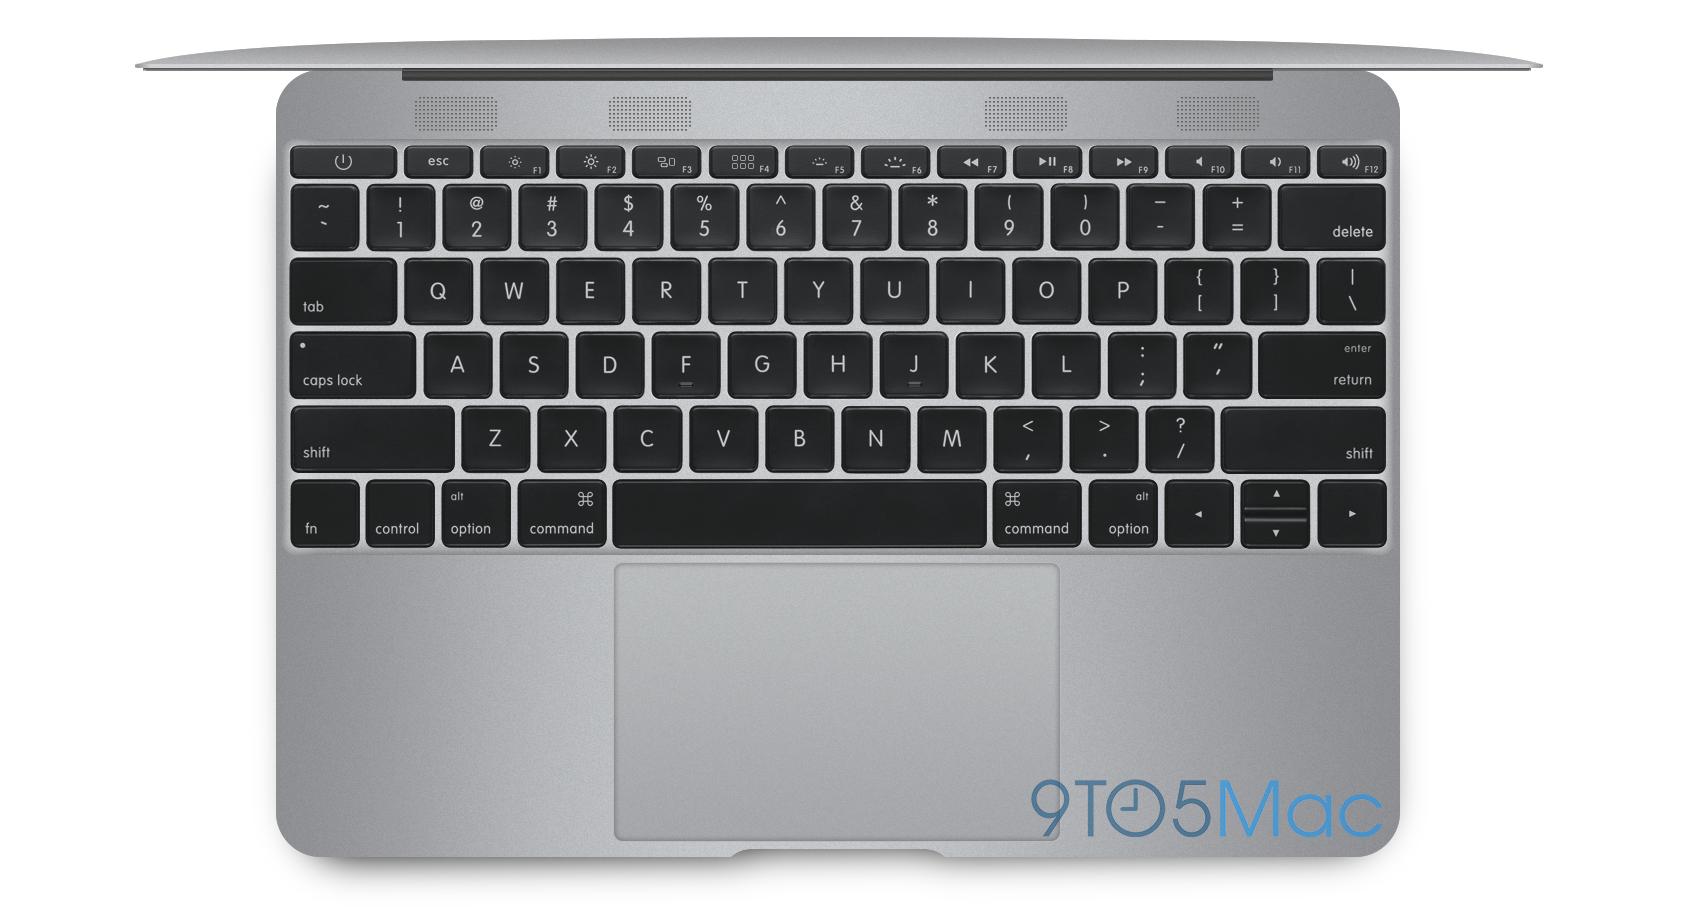 Apple 15 4 Macbook Pro Mc373ll A Intel Core I7 4gb Ram 500gb Hdd Was 999 Now 539 99 Apple Laptop Apple Macbook Macbook